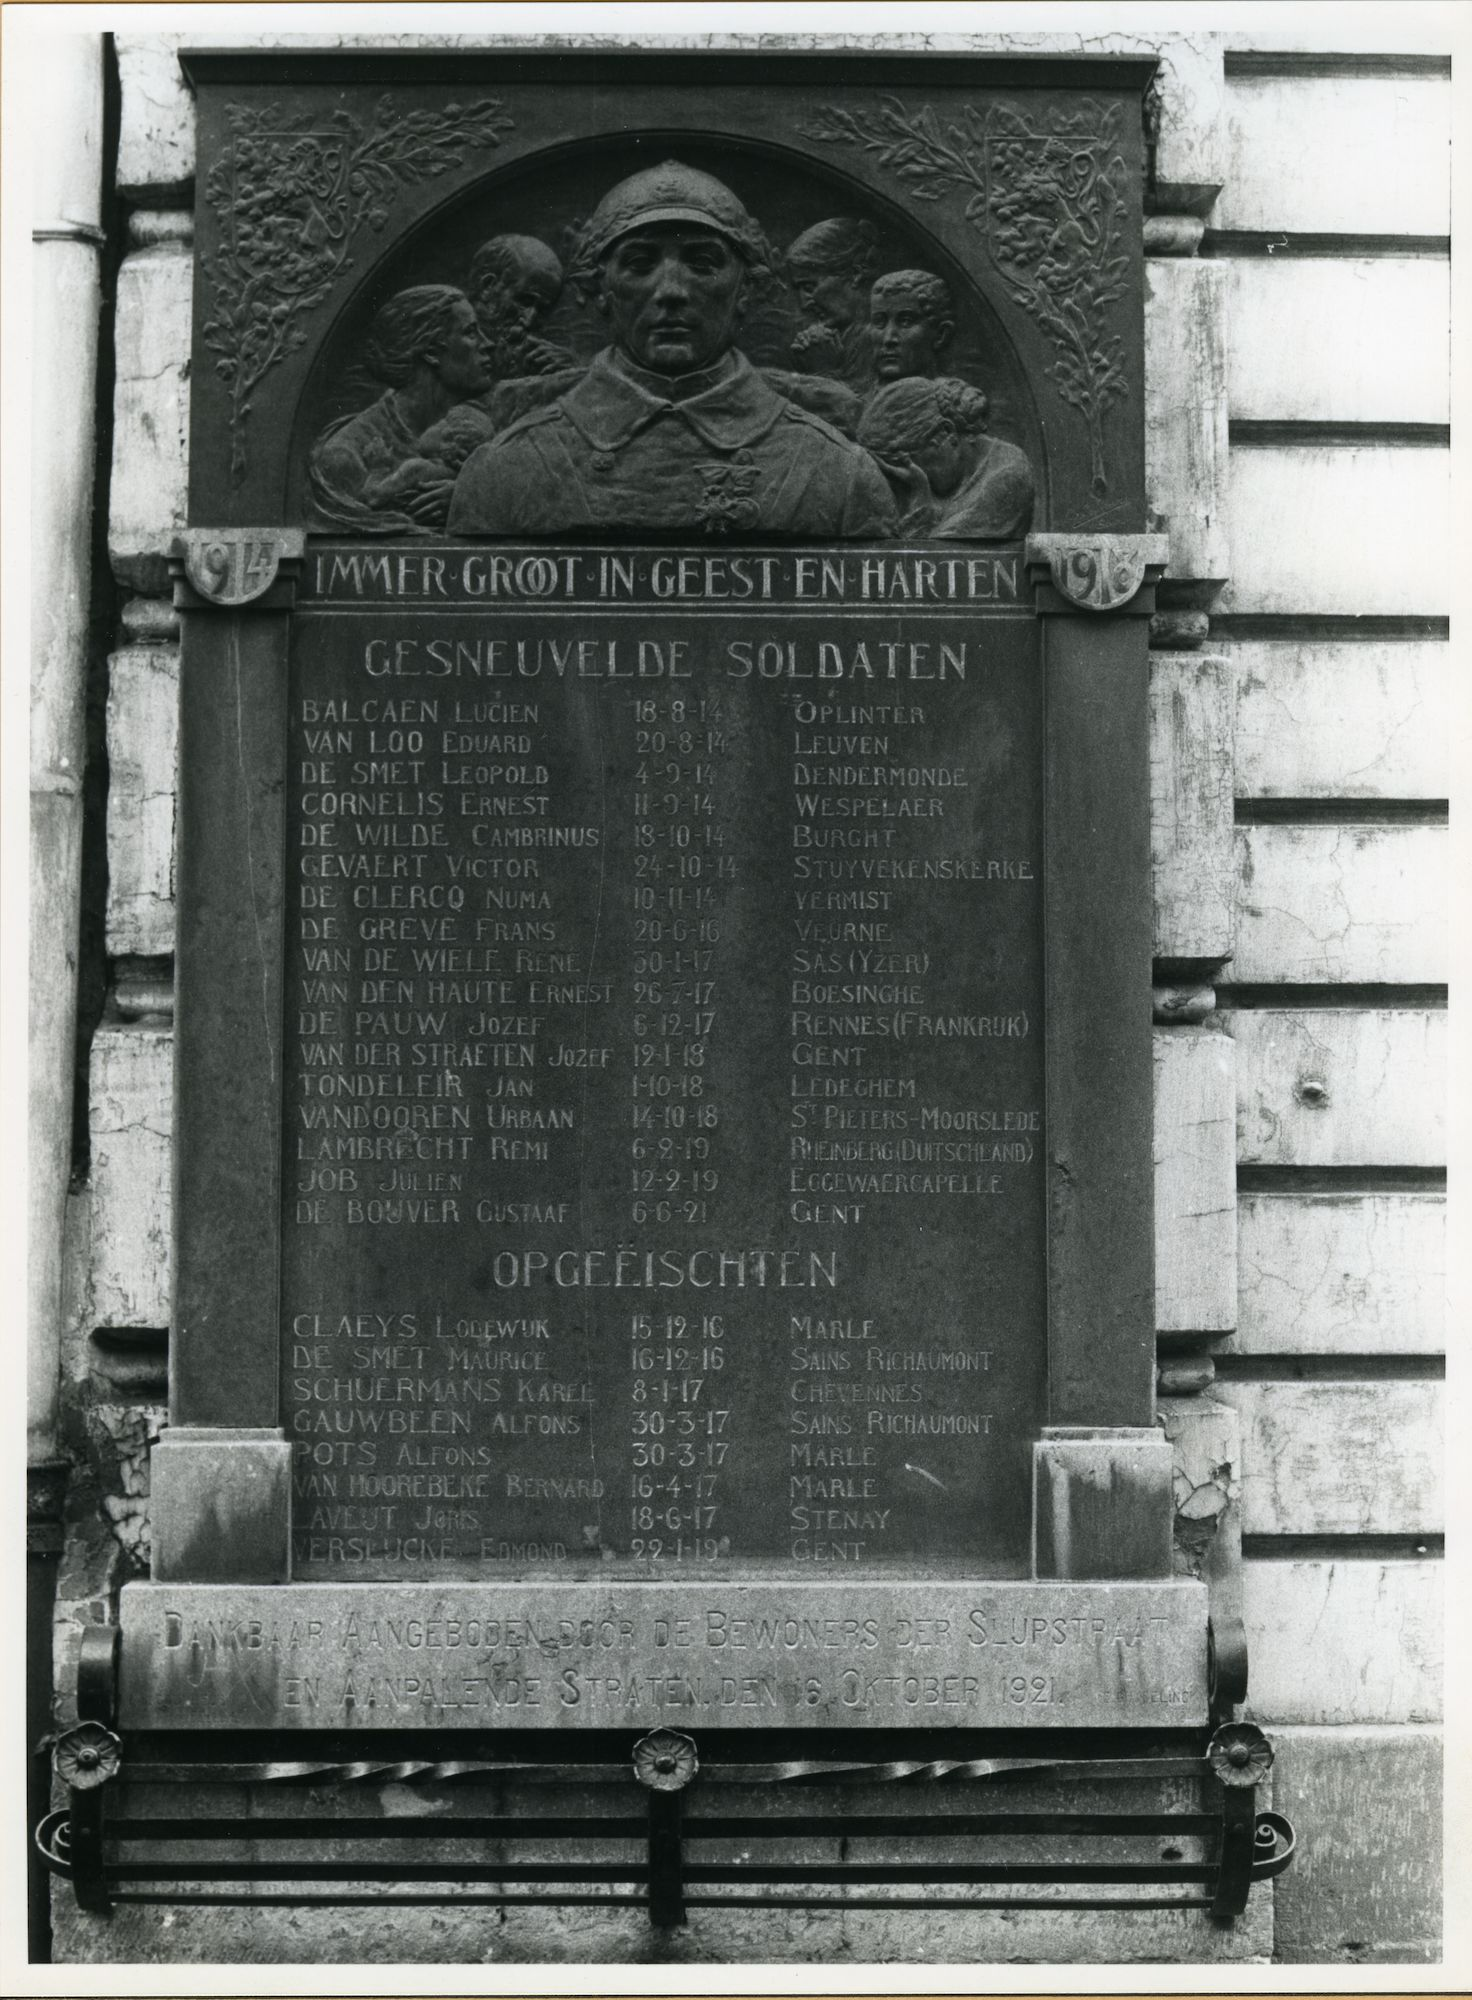 Gent: Sleepstraat 145: Oorlogsgedenkplaat, 1979